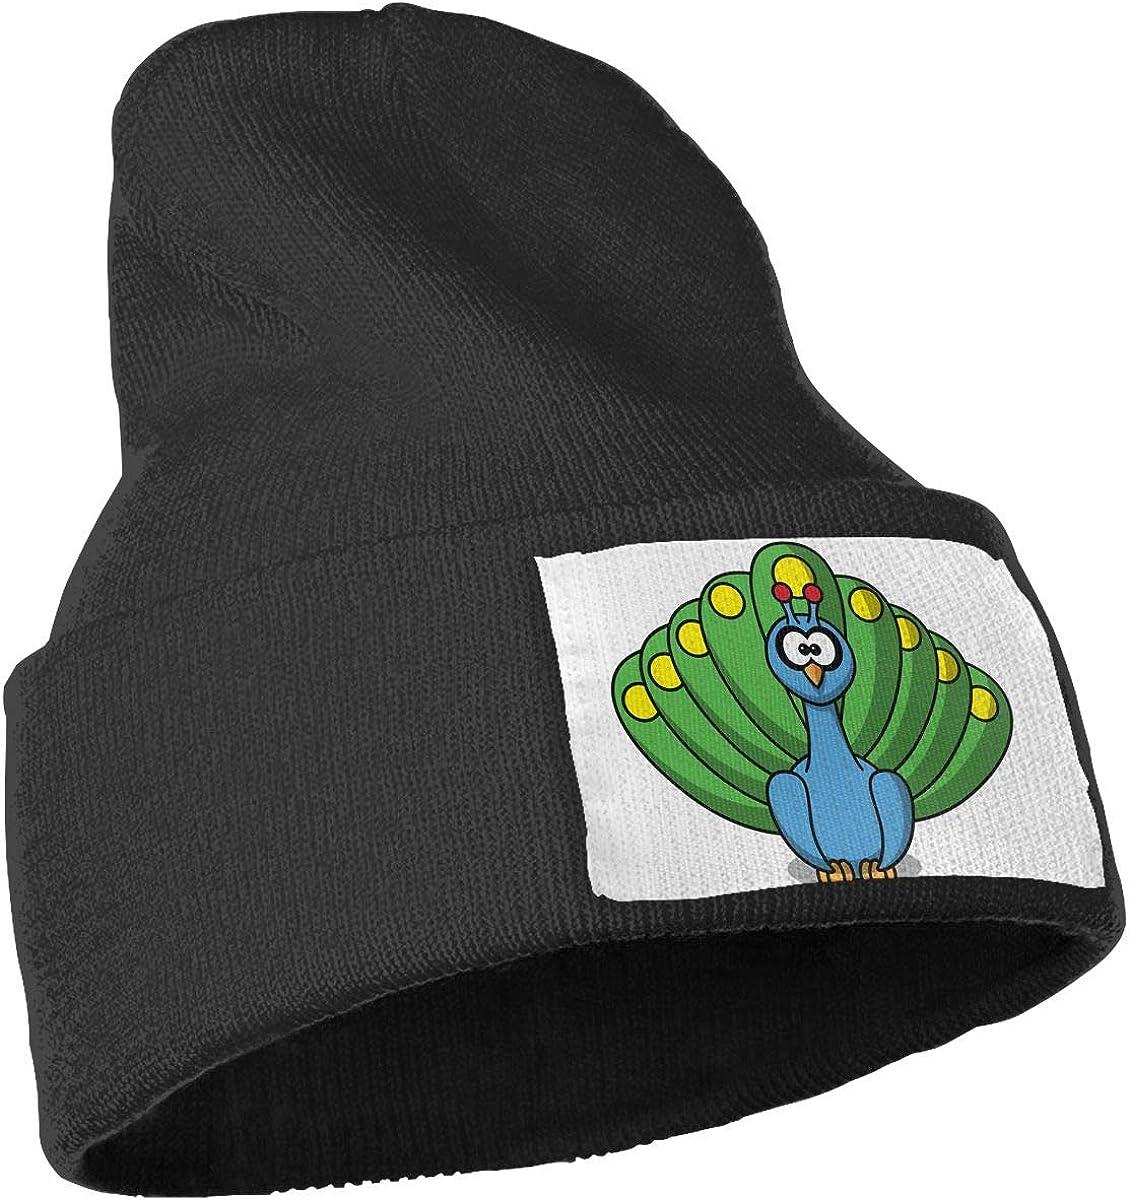 TAOMAP89 Brazil Flag Men /& Women Skull Caps Winter Warm Stretchy Knit Beanie Hats